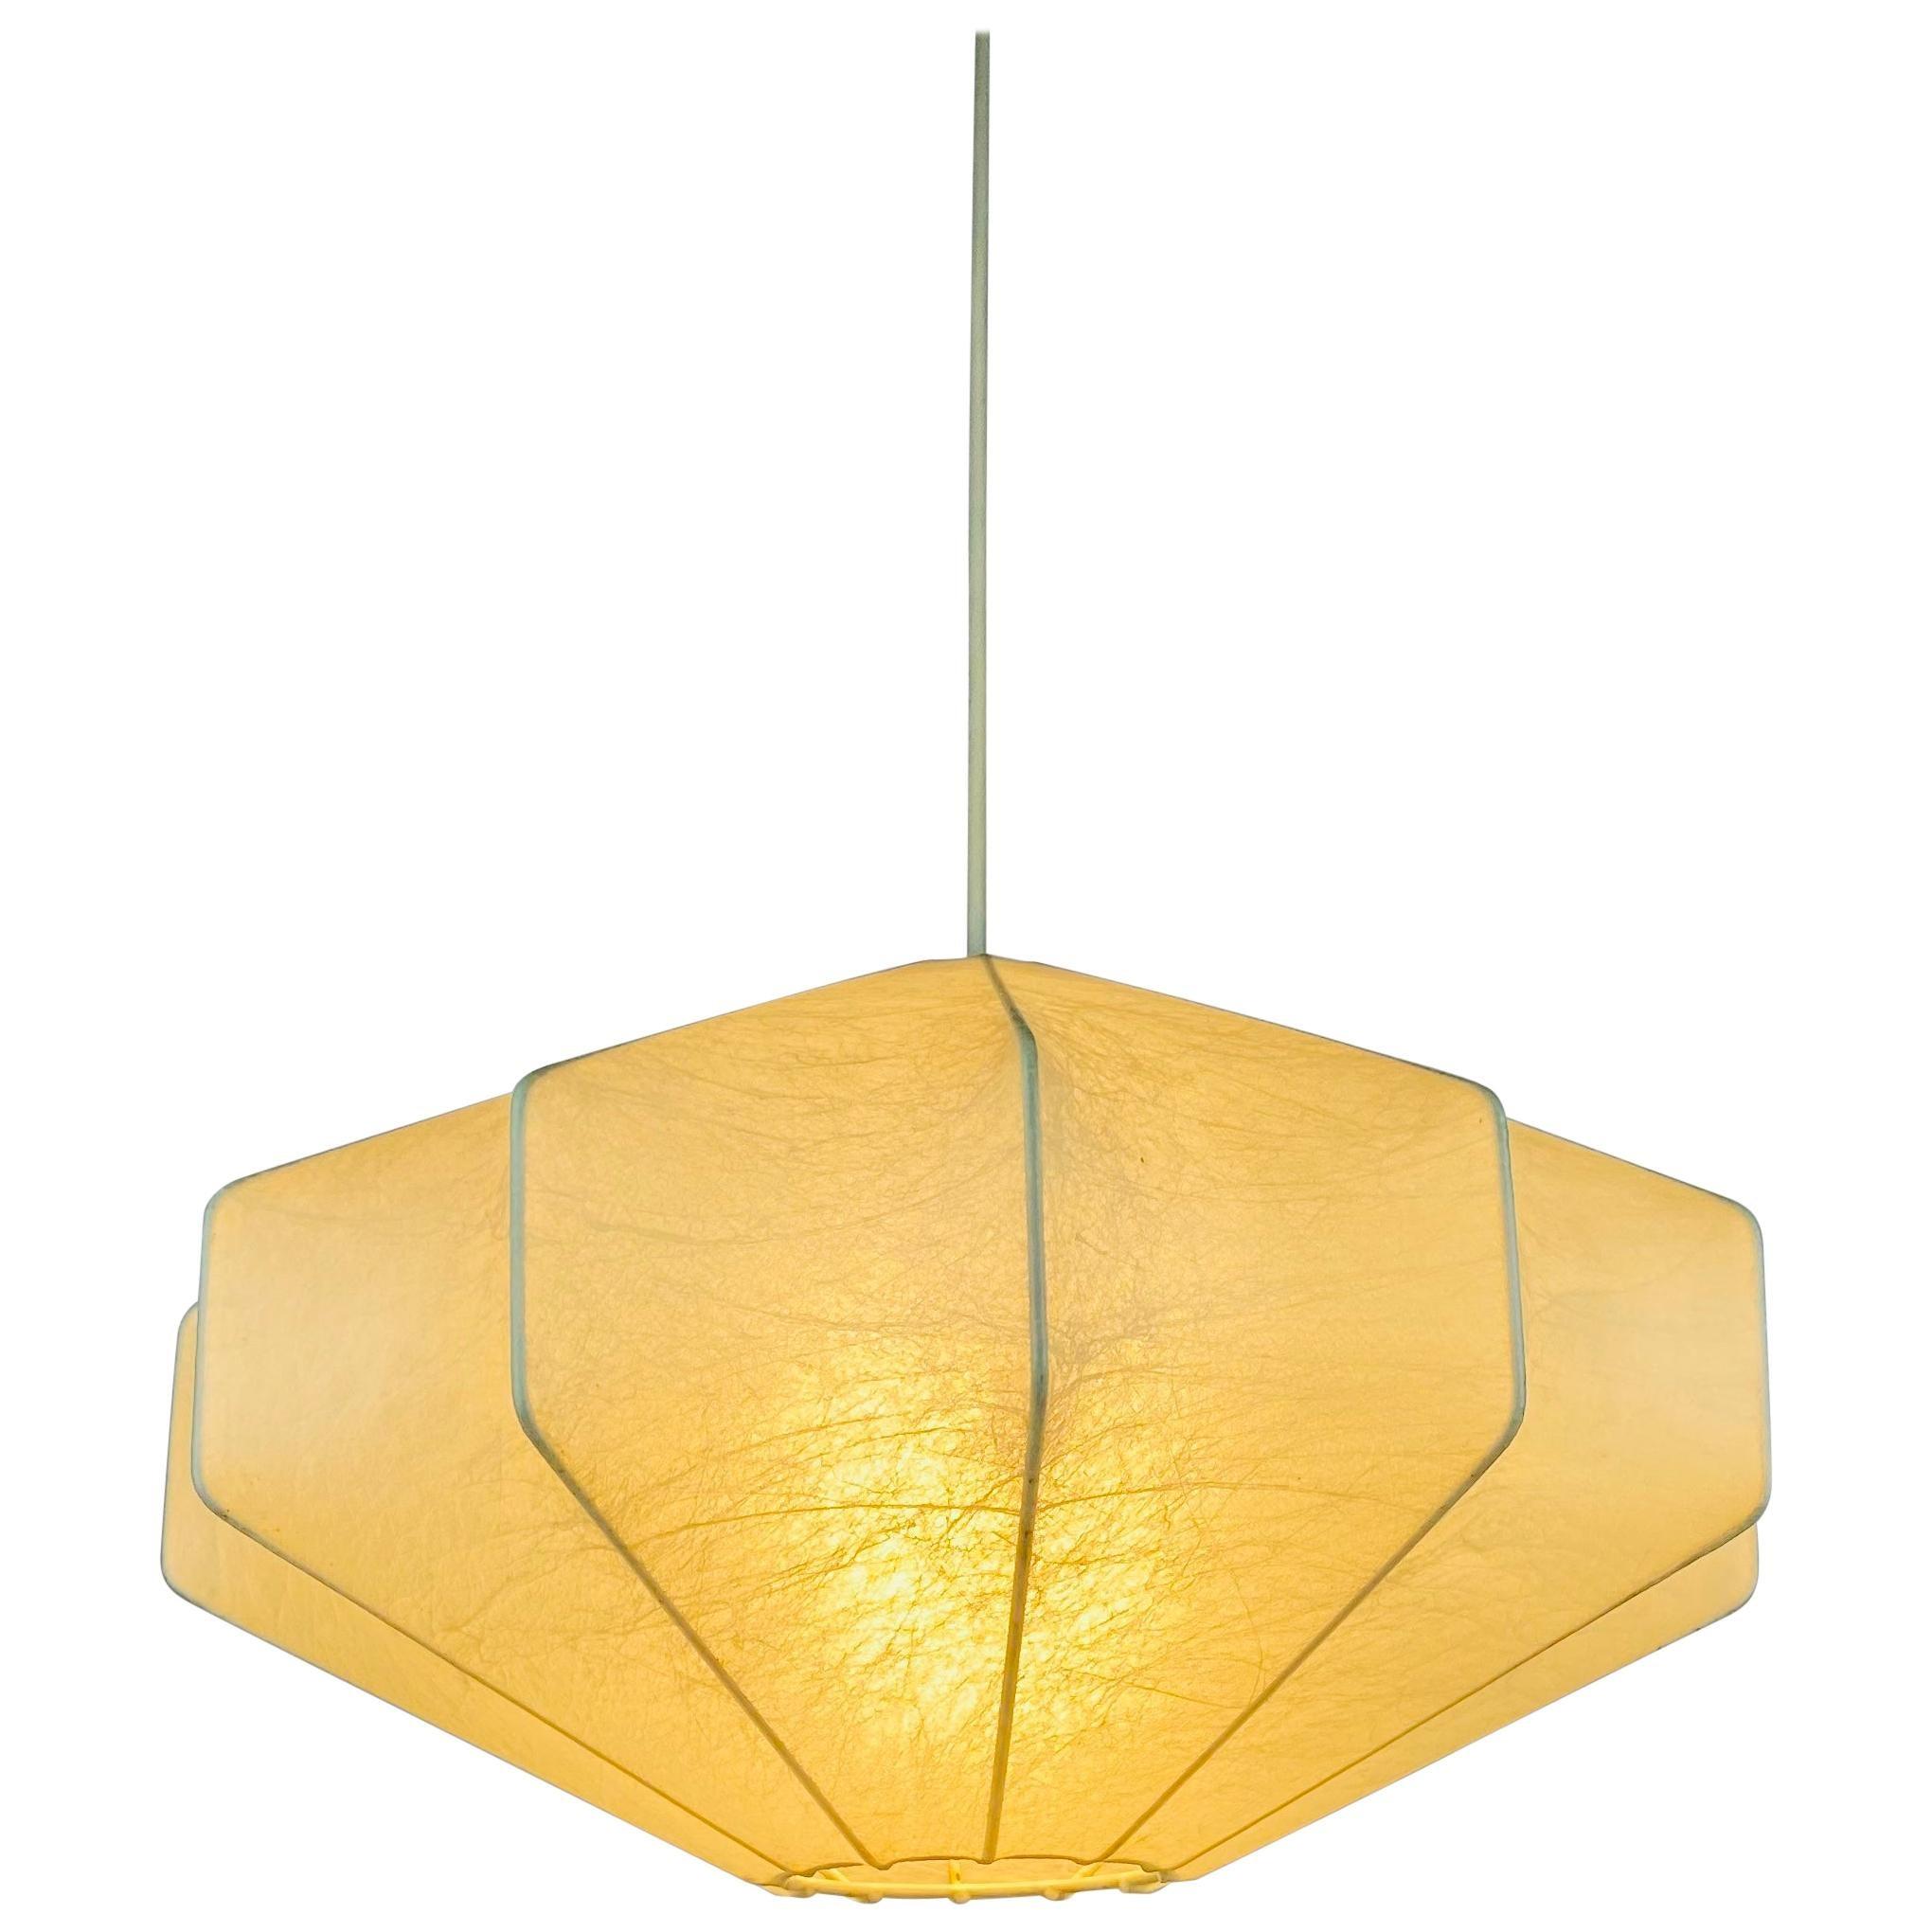 Midcentury Cocoon Losange Pendant Light, 1960s, Italy